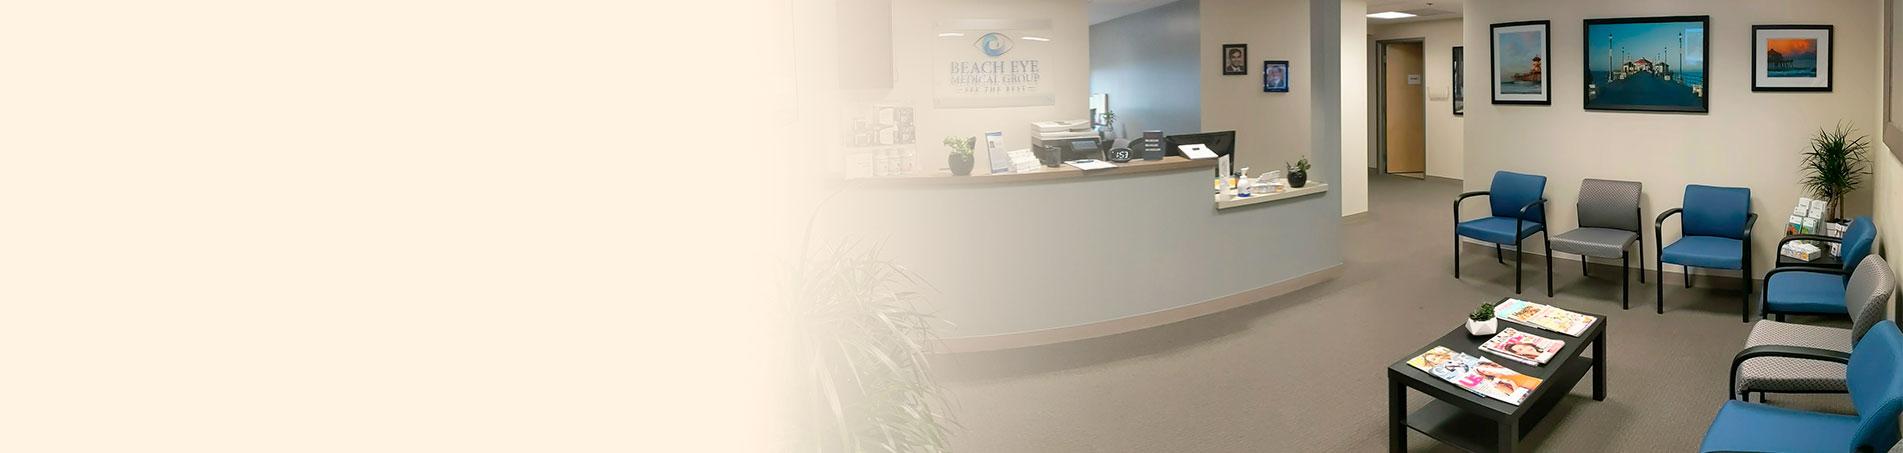 SERVICES. Beach Eye Medical Group